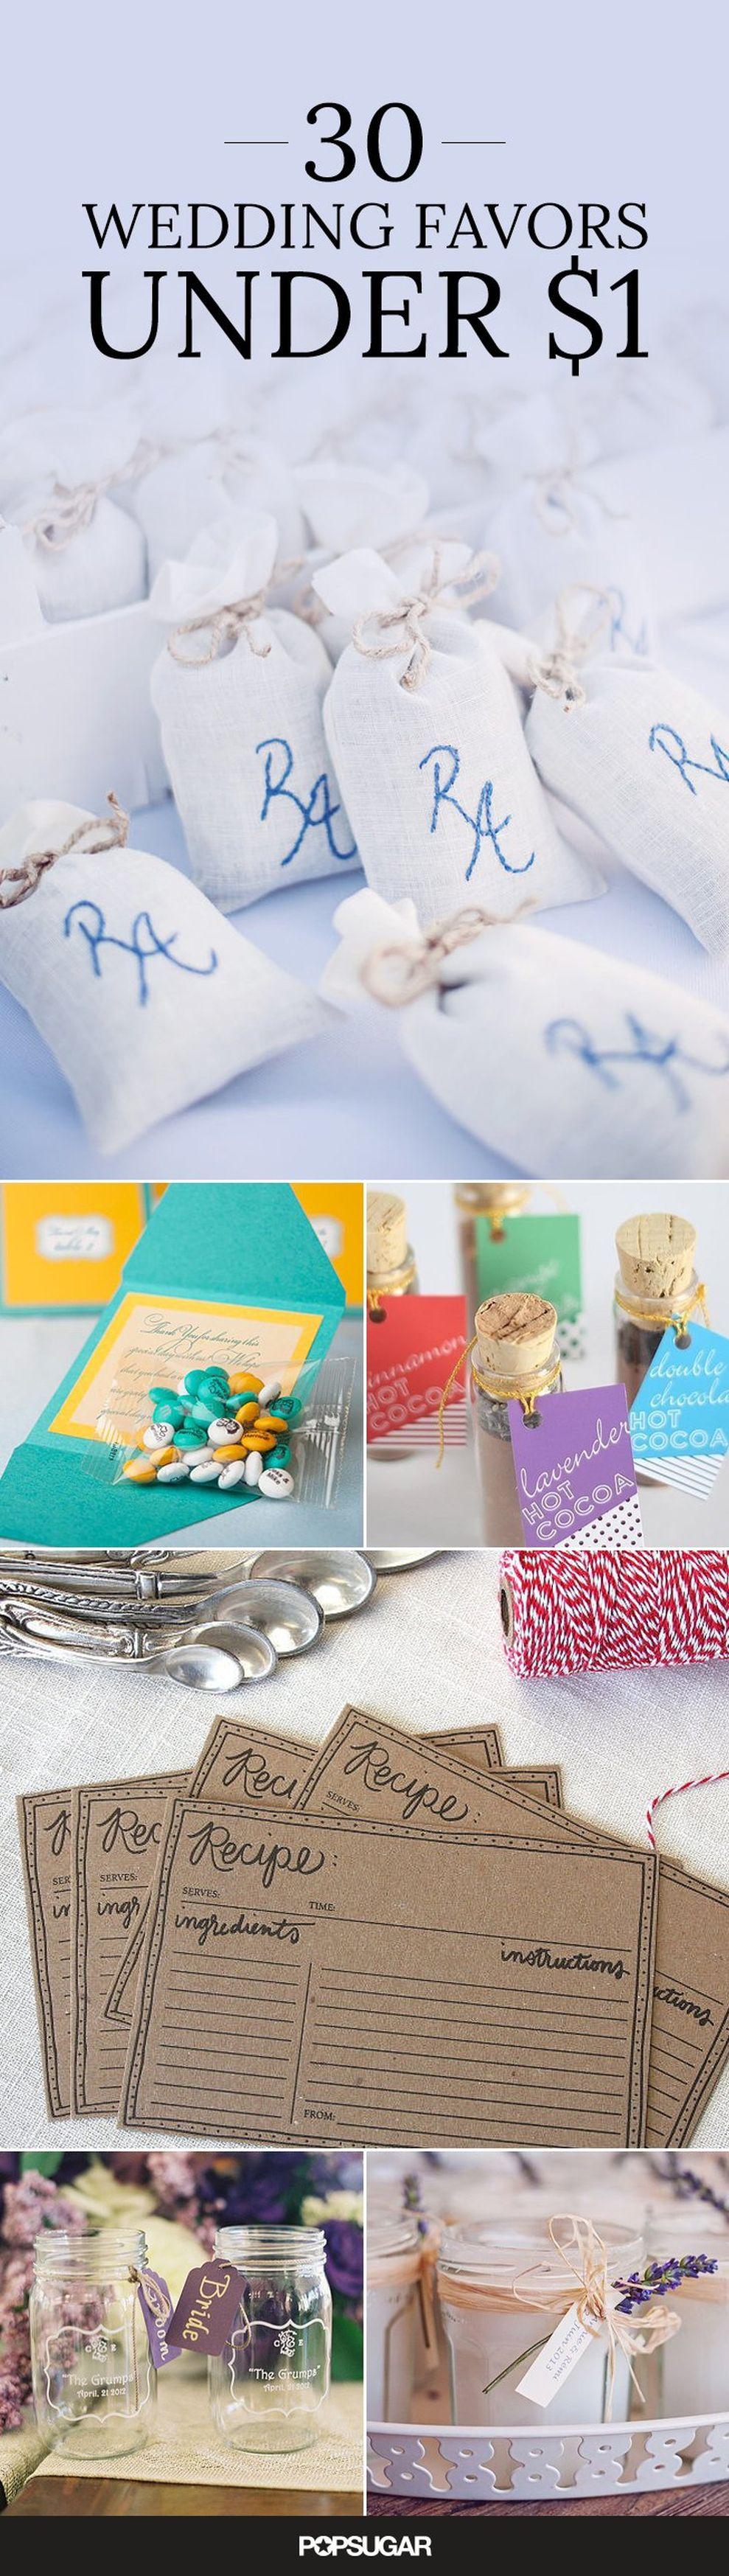 Diy wedding shower decorations   Incredible DIY Bridal Shower Decorations on a Budget  Bridal